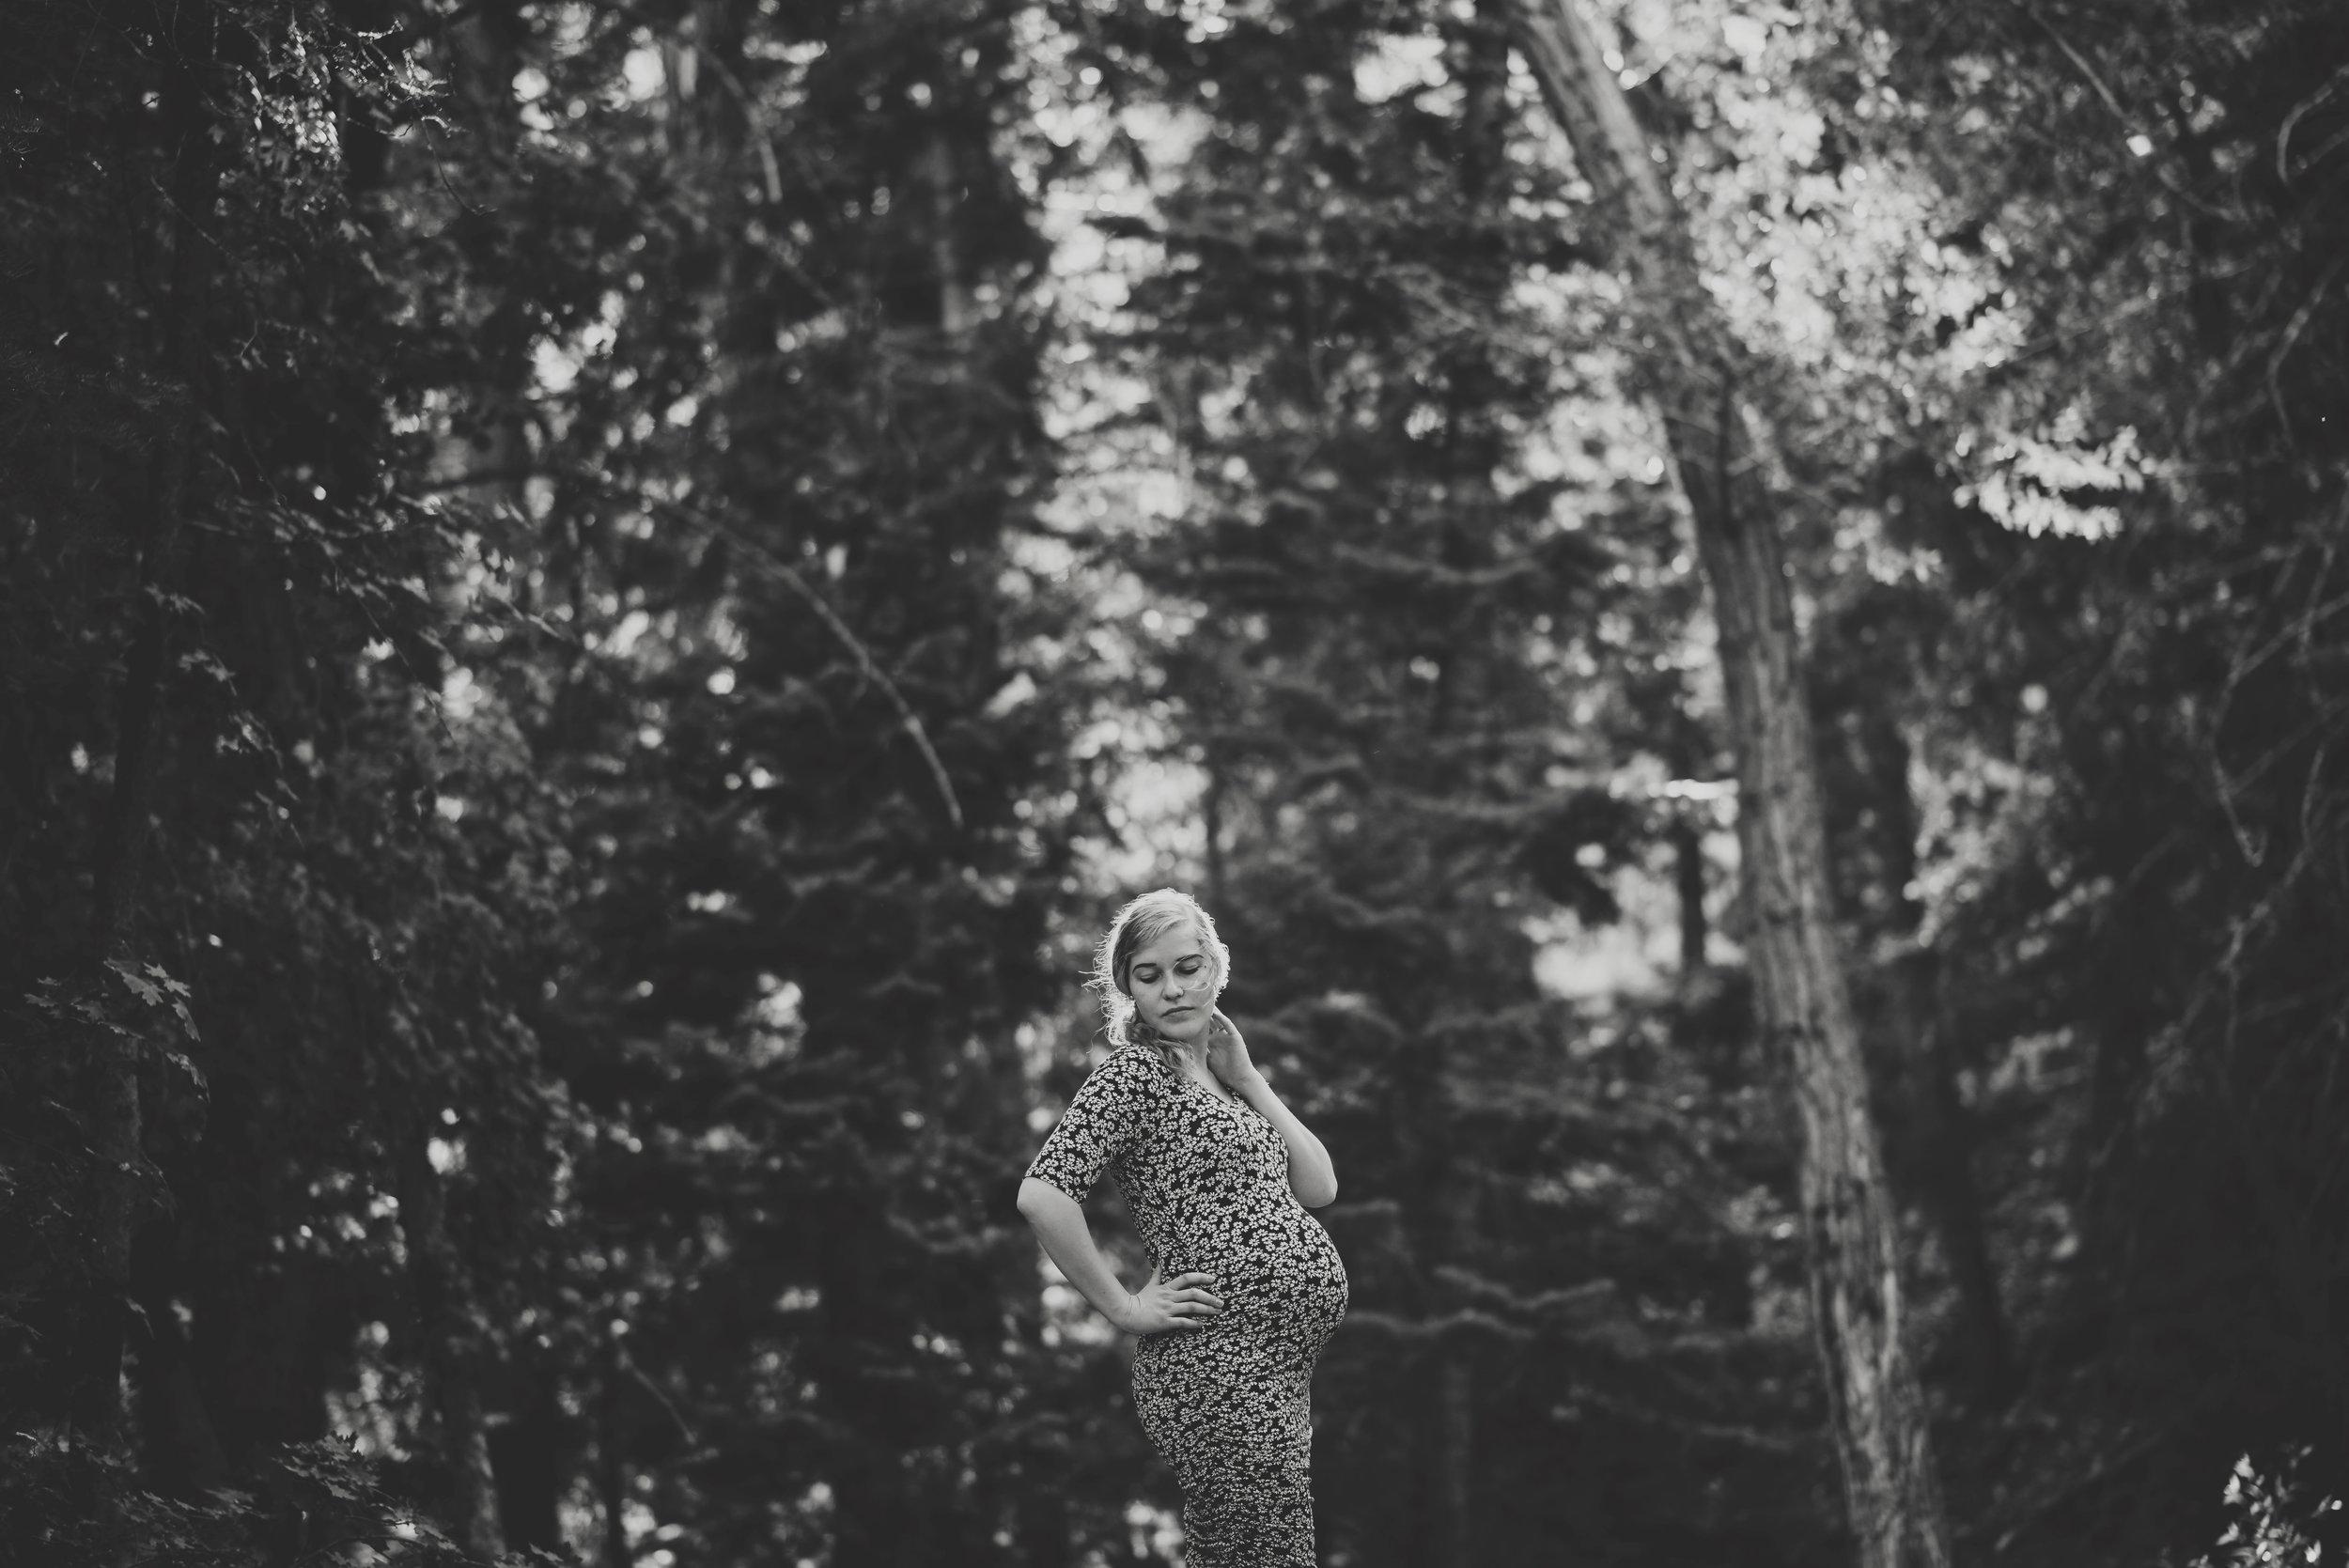 Kambrie_Landon_Maternity091bw.jpg